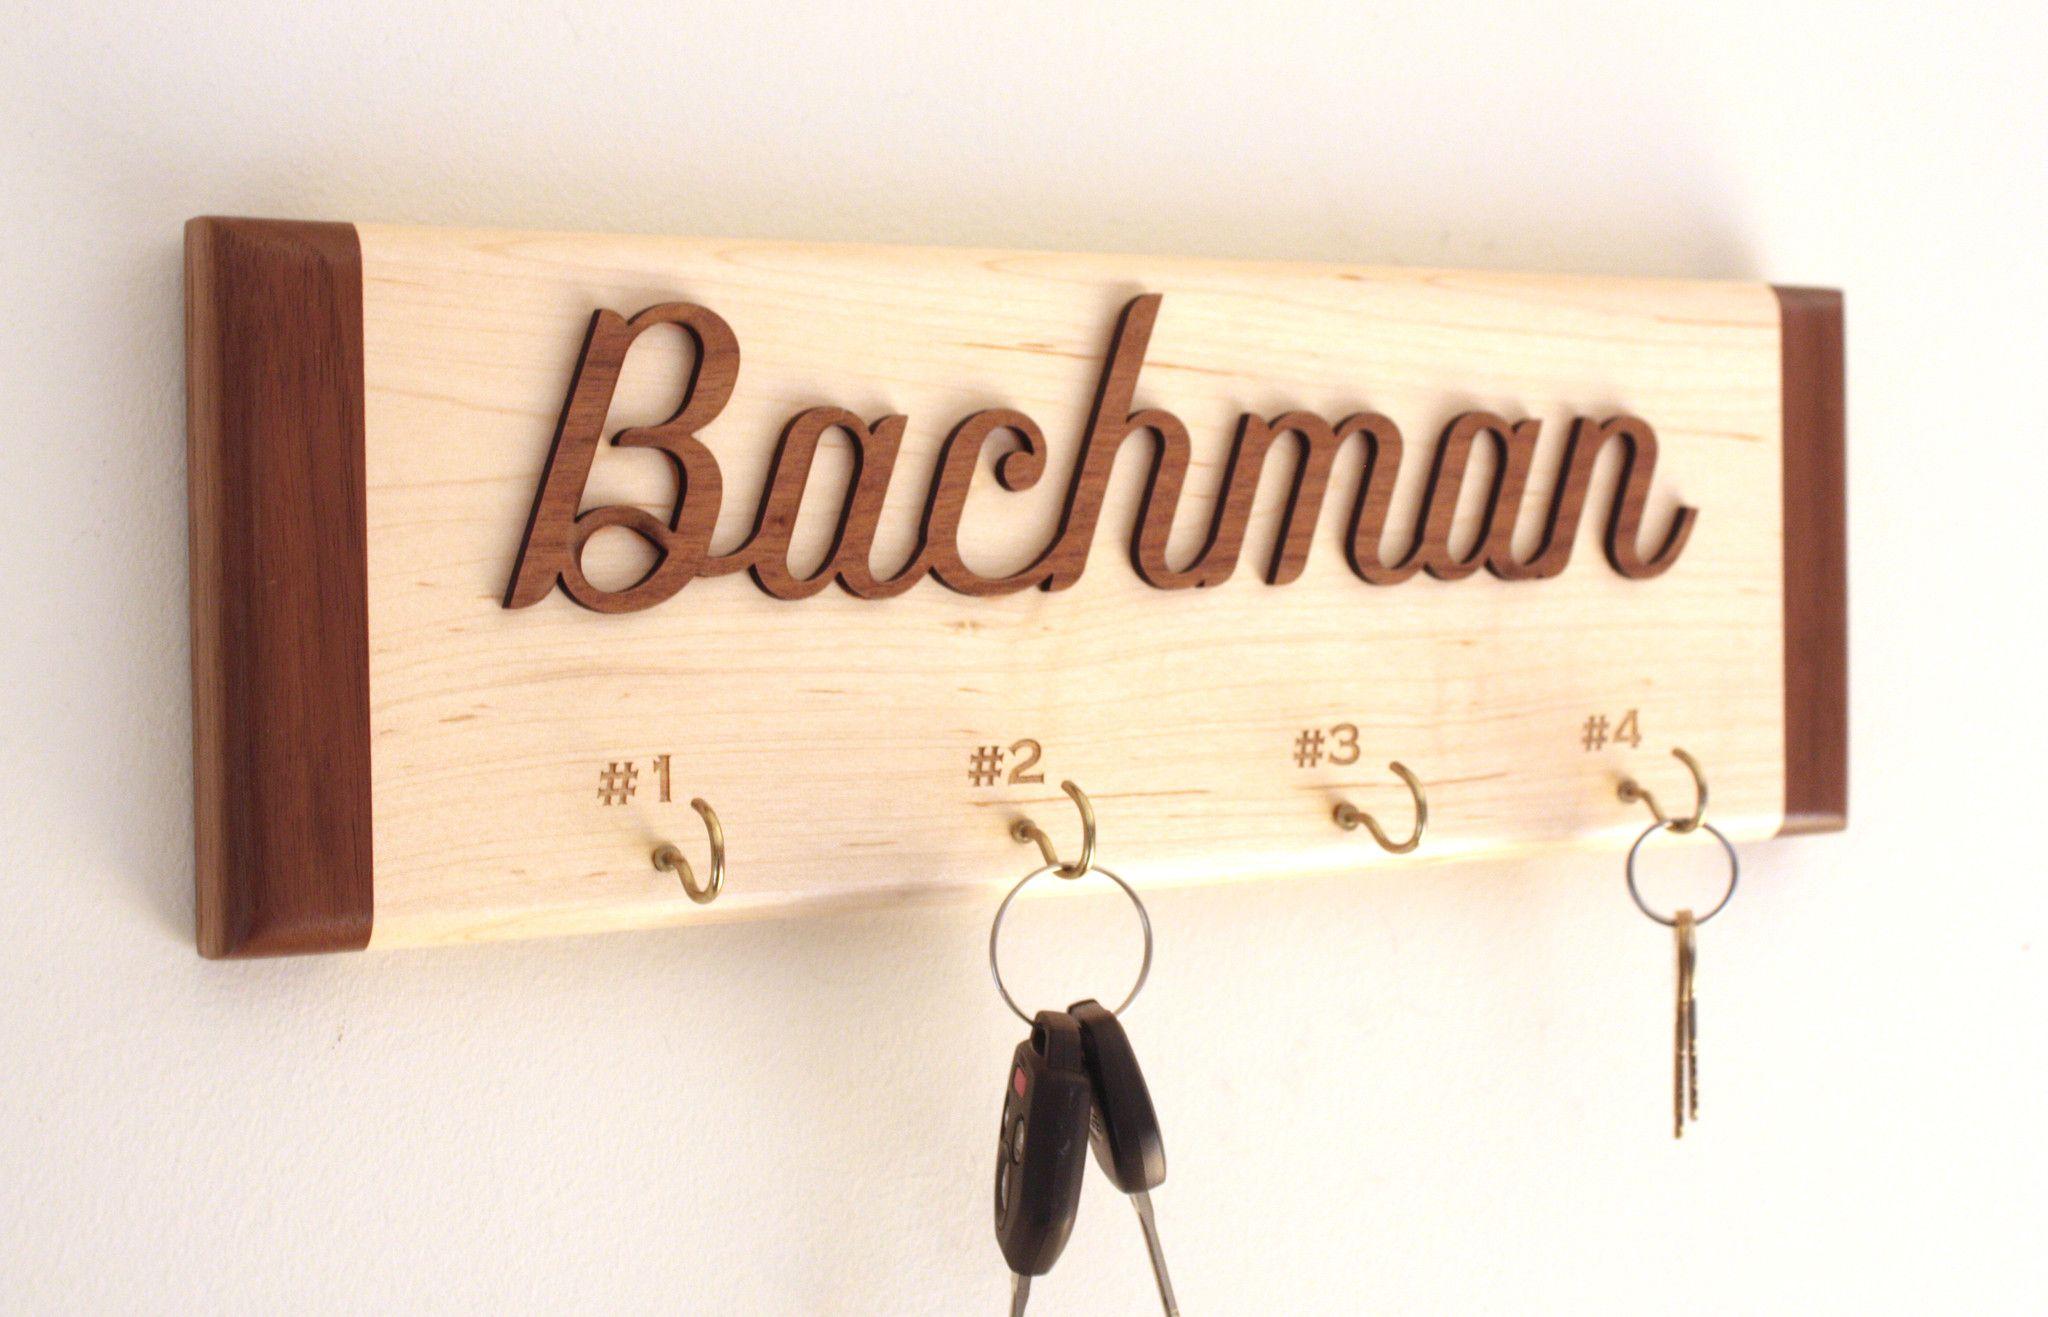 Personalized Wall Key Holder  Wooden Key Rack By Tri~Elegance